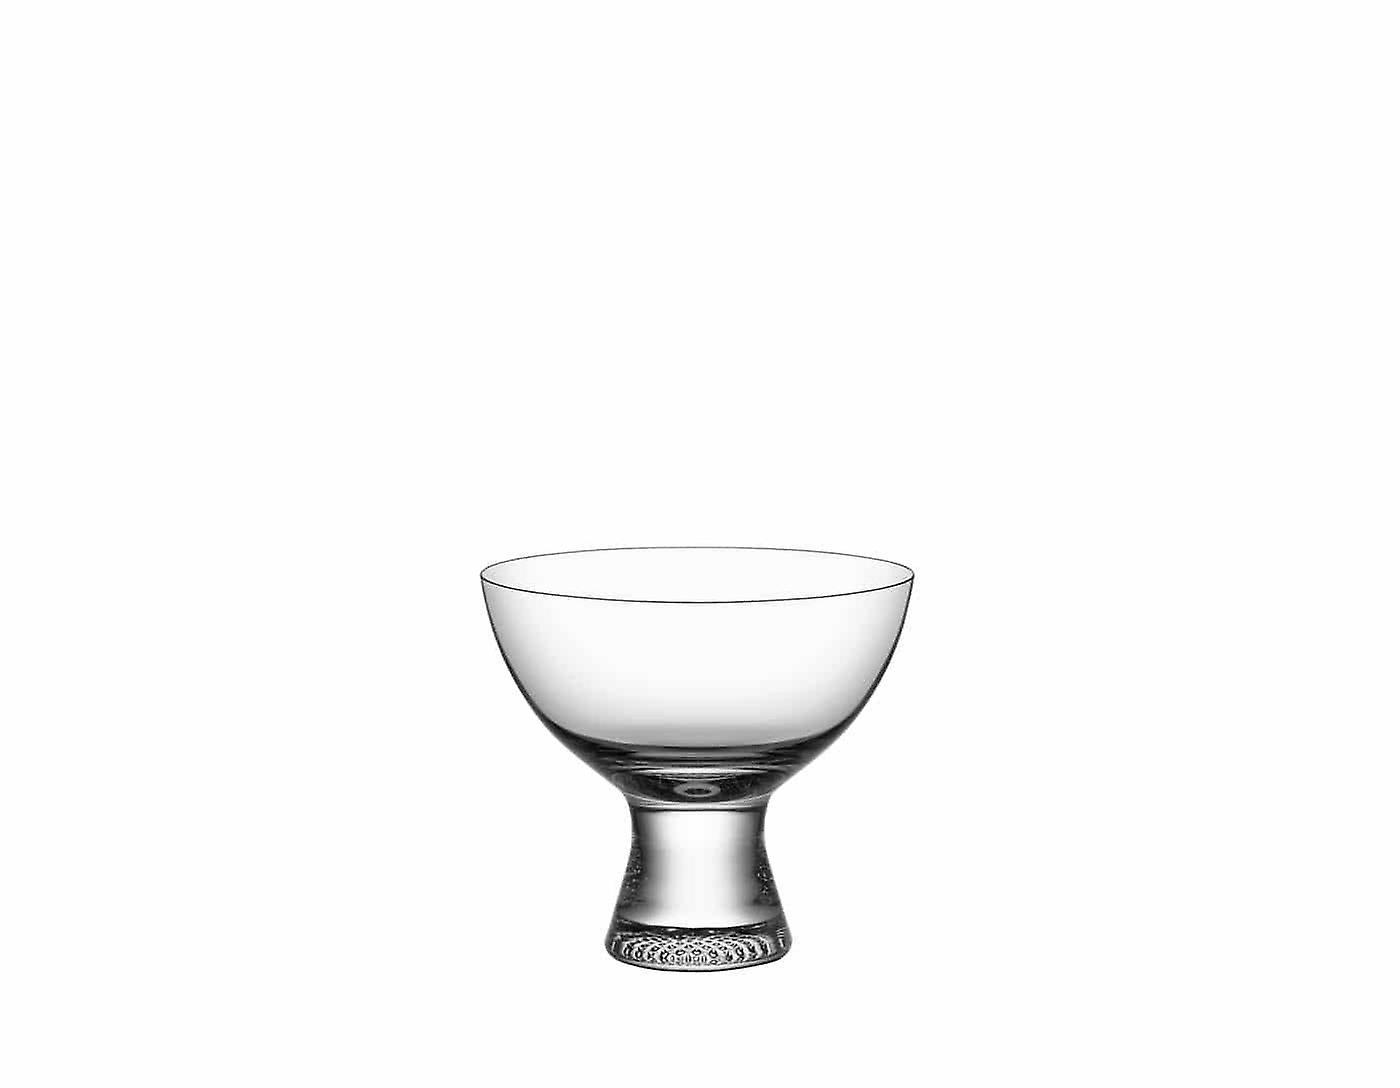 Kosta Boda  - LIMELIGHT -  6 st Coupe / champagneglas Design Göran Wärff